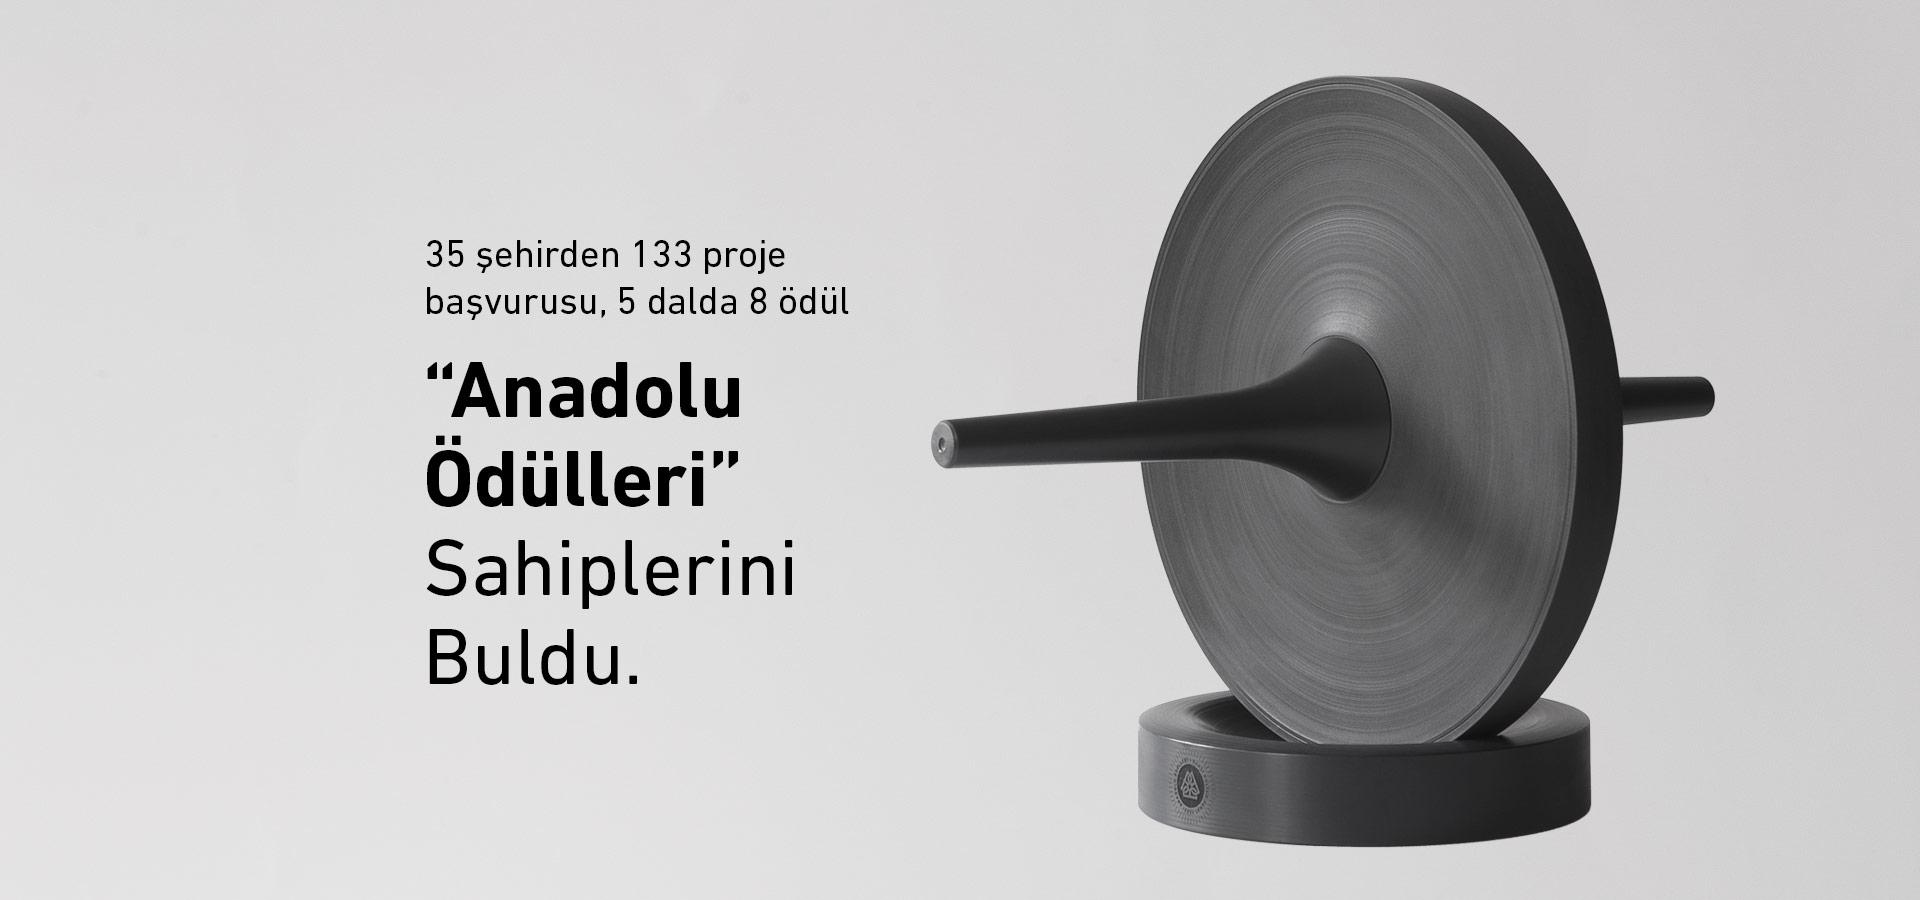 CABININ awarded by Baksı Culture and Arts Foudation